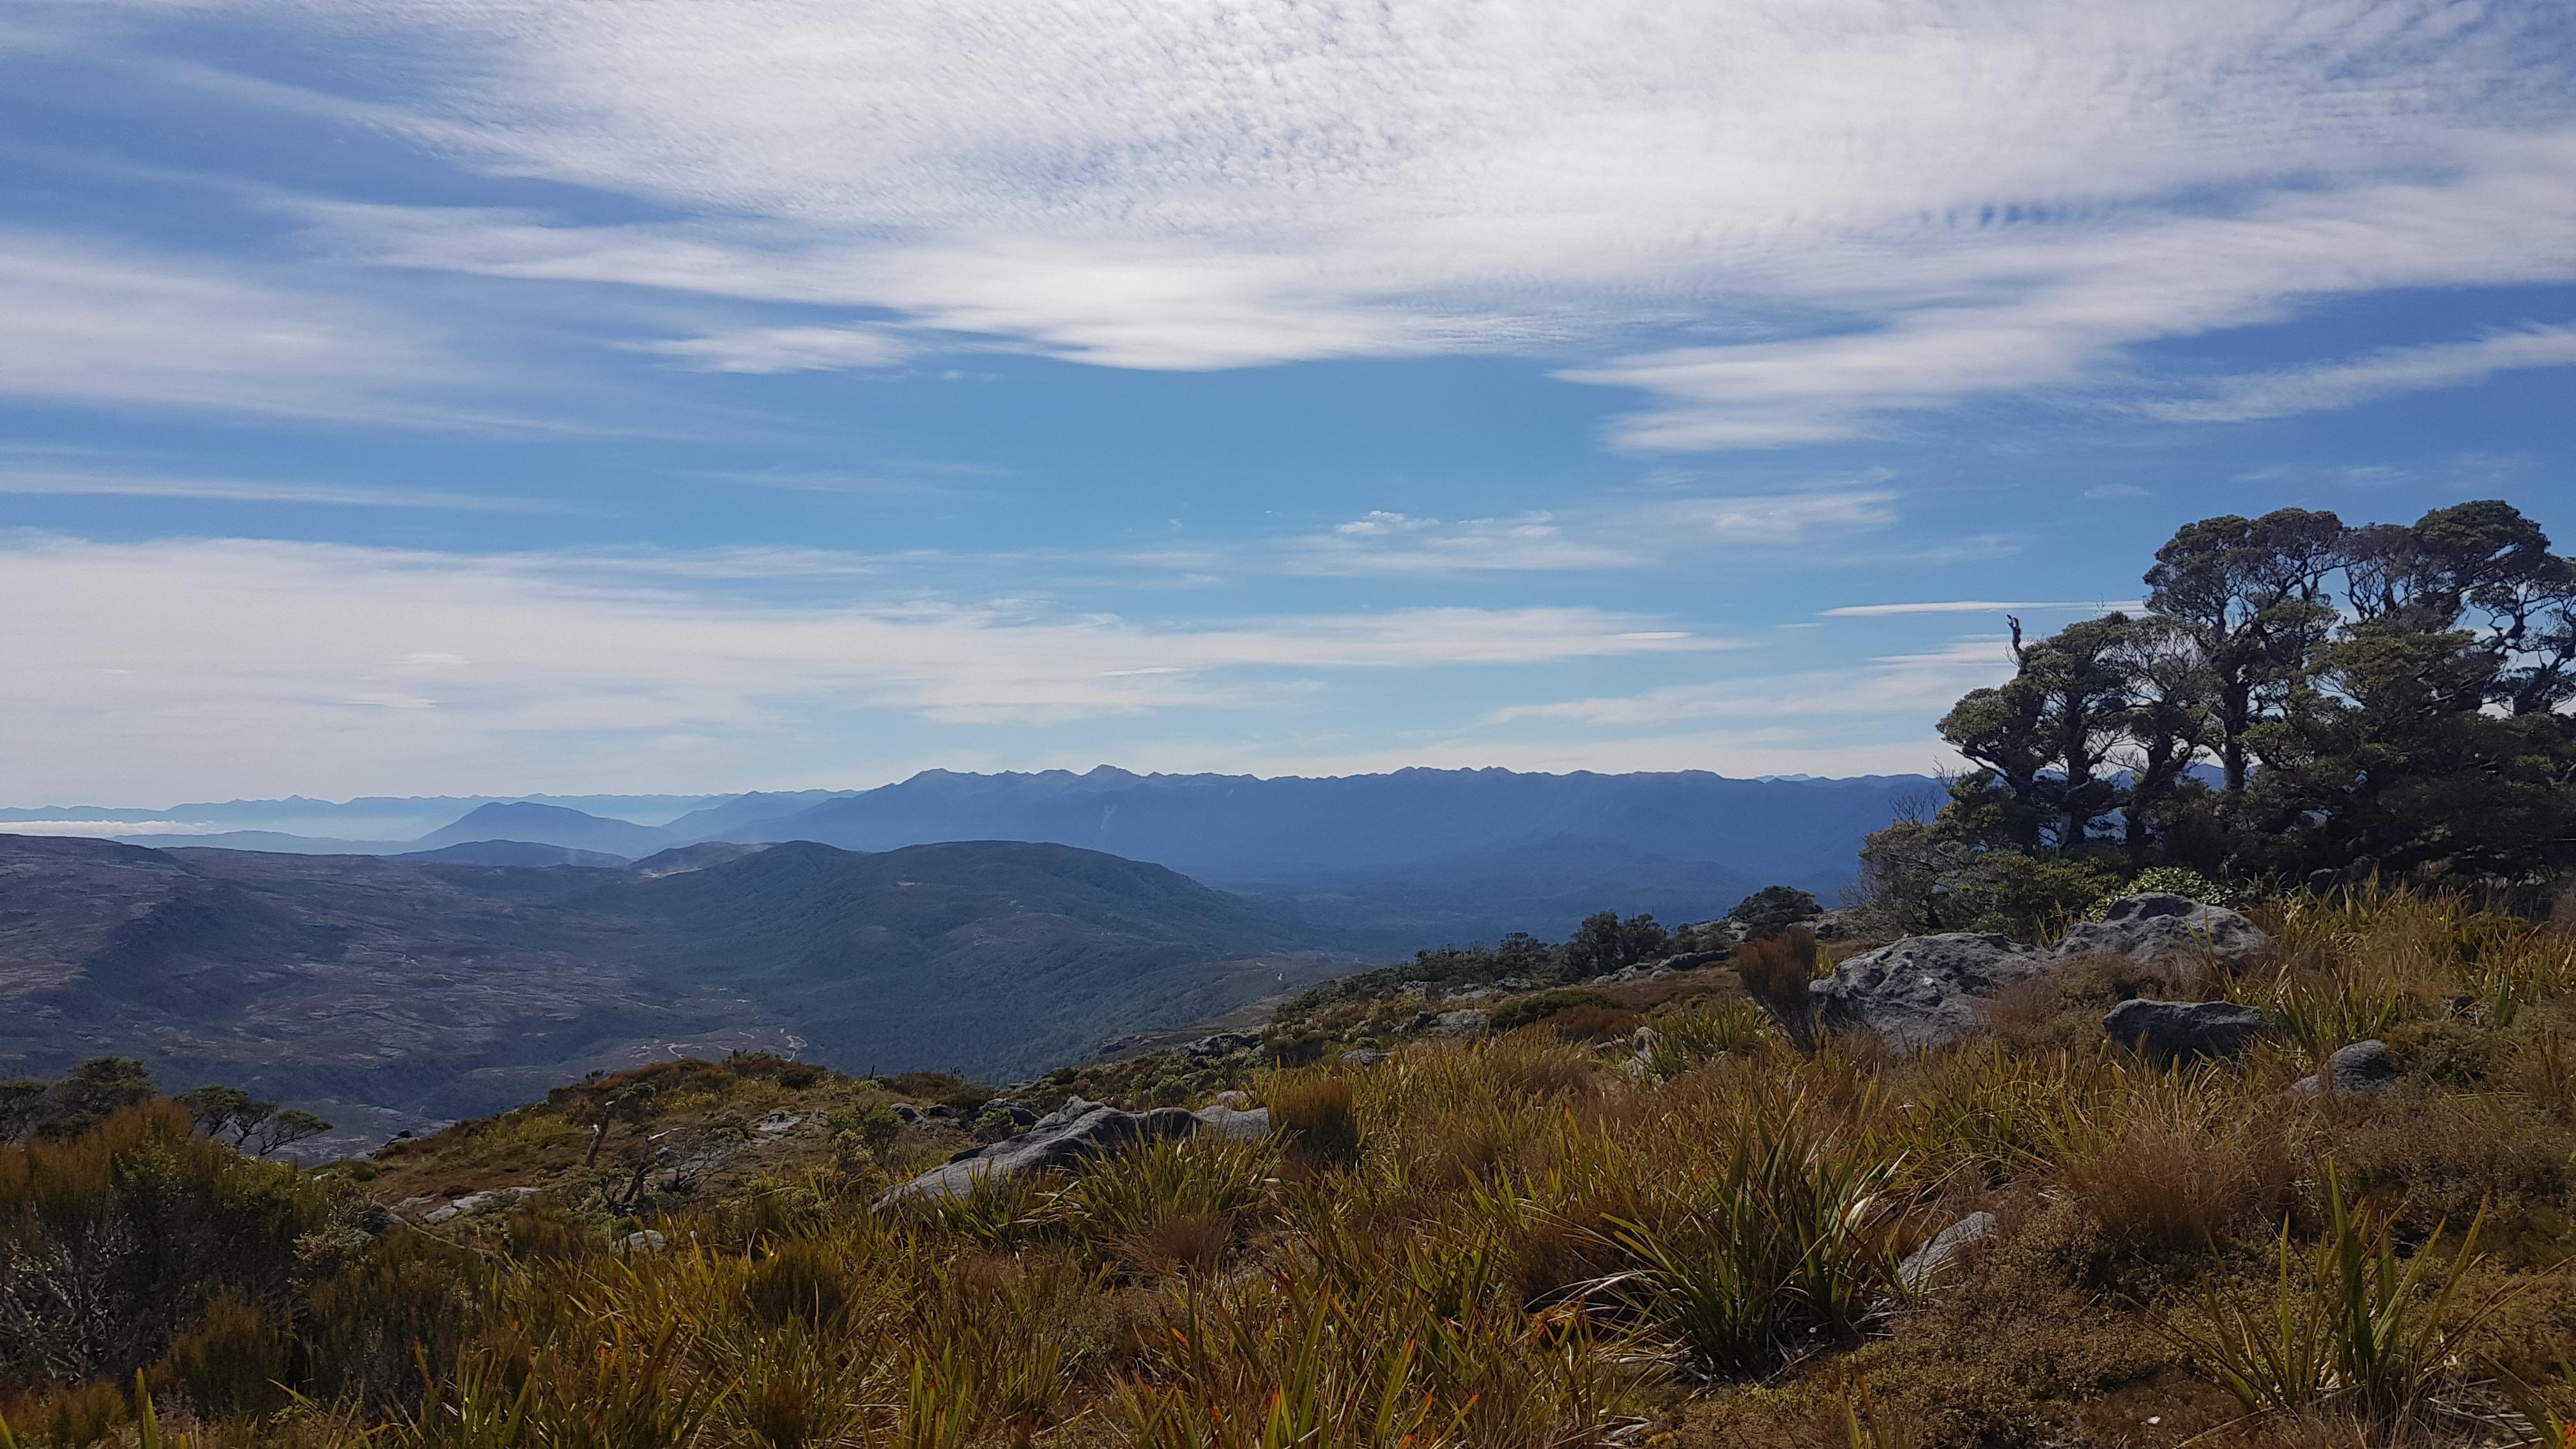 Myra's track to Mt William